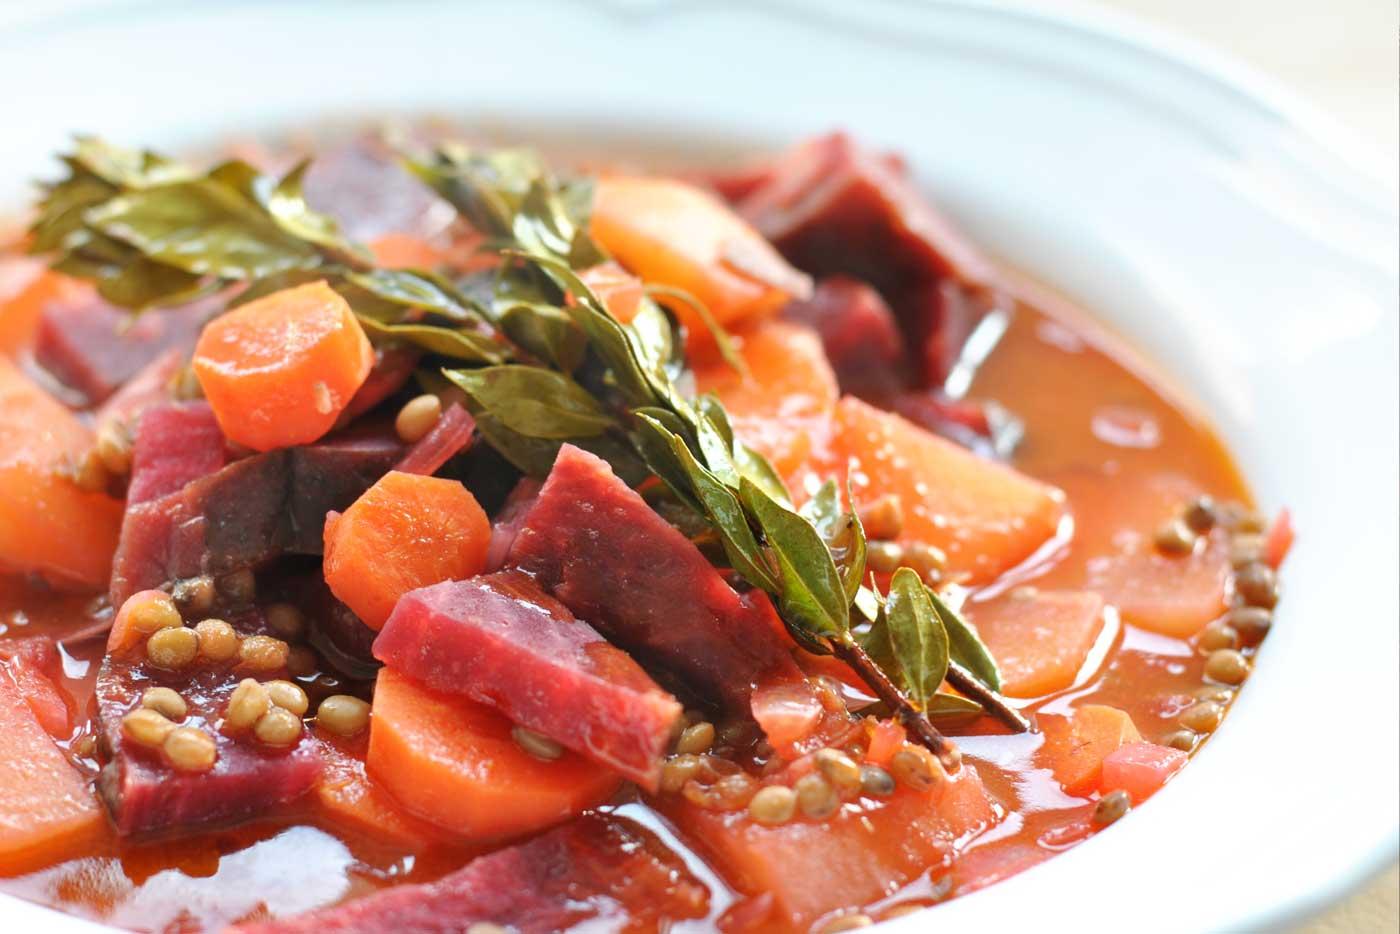 zuppa-di-verdure-invernali-img-post-2